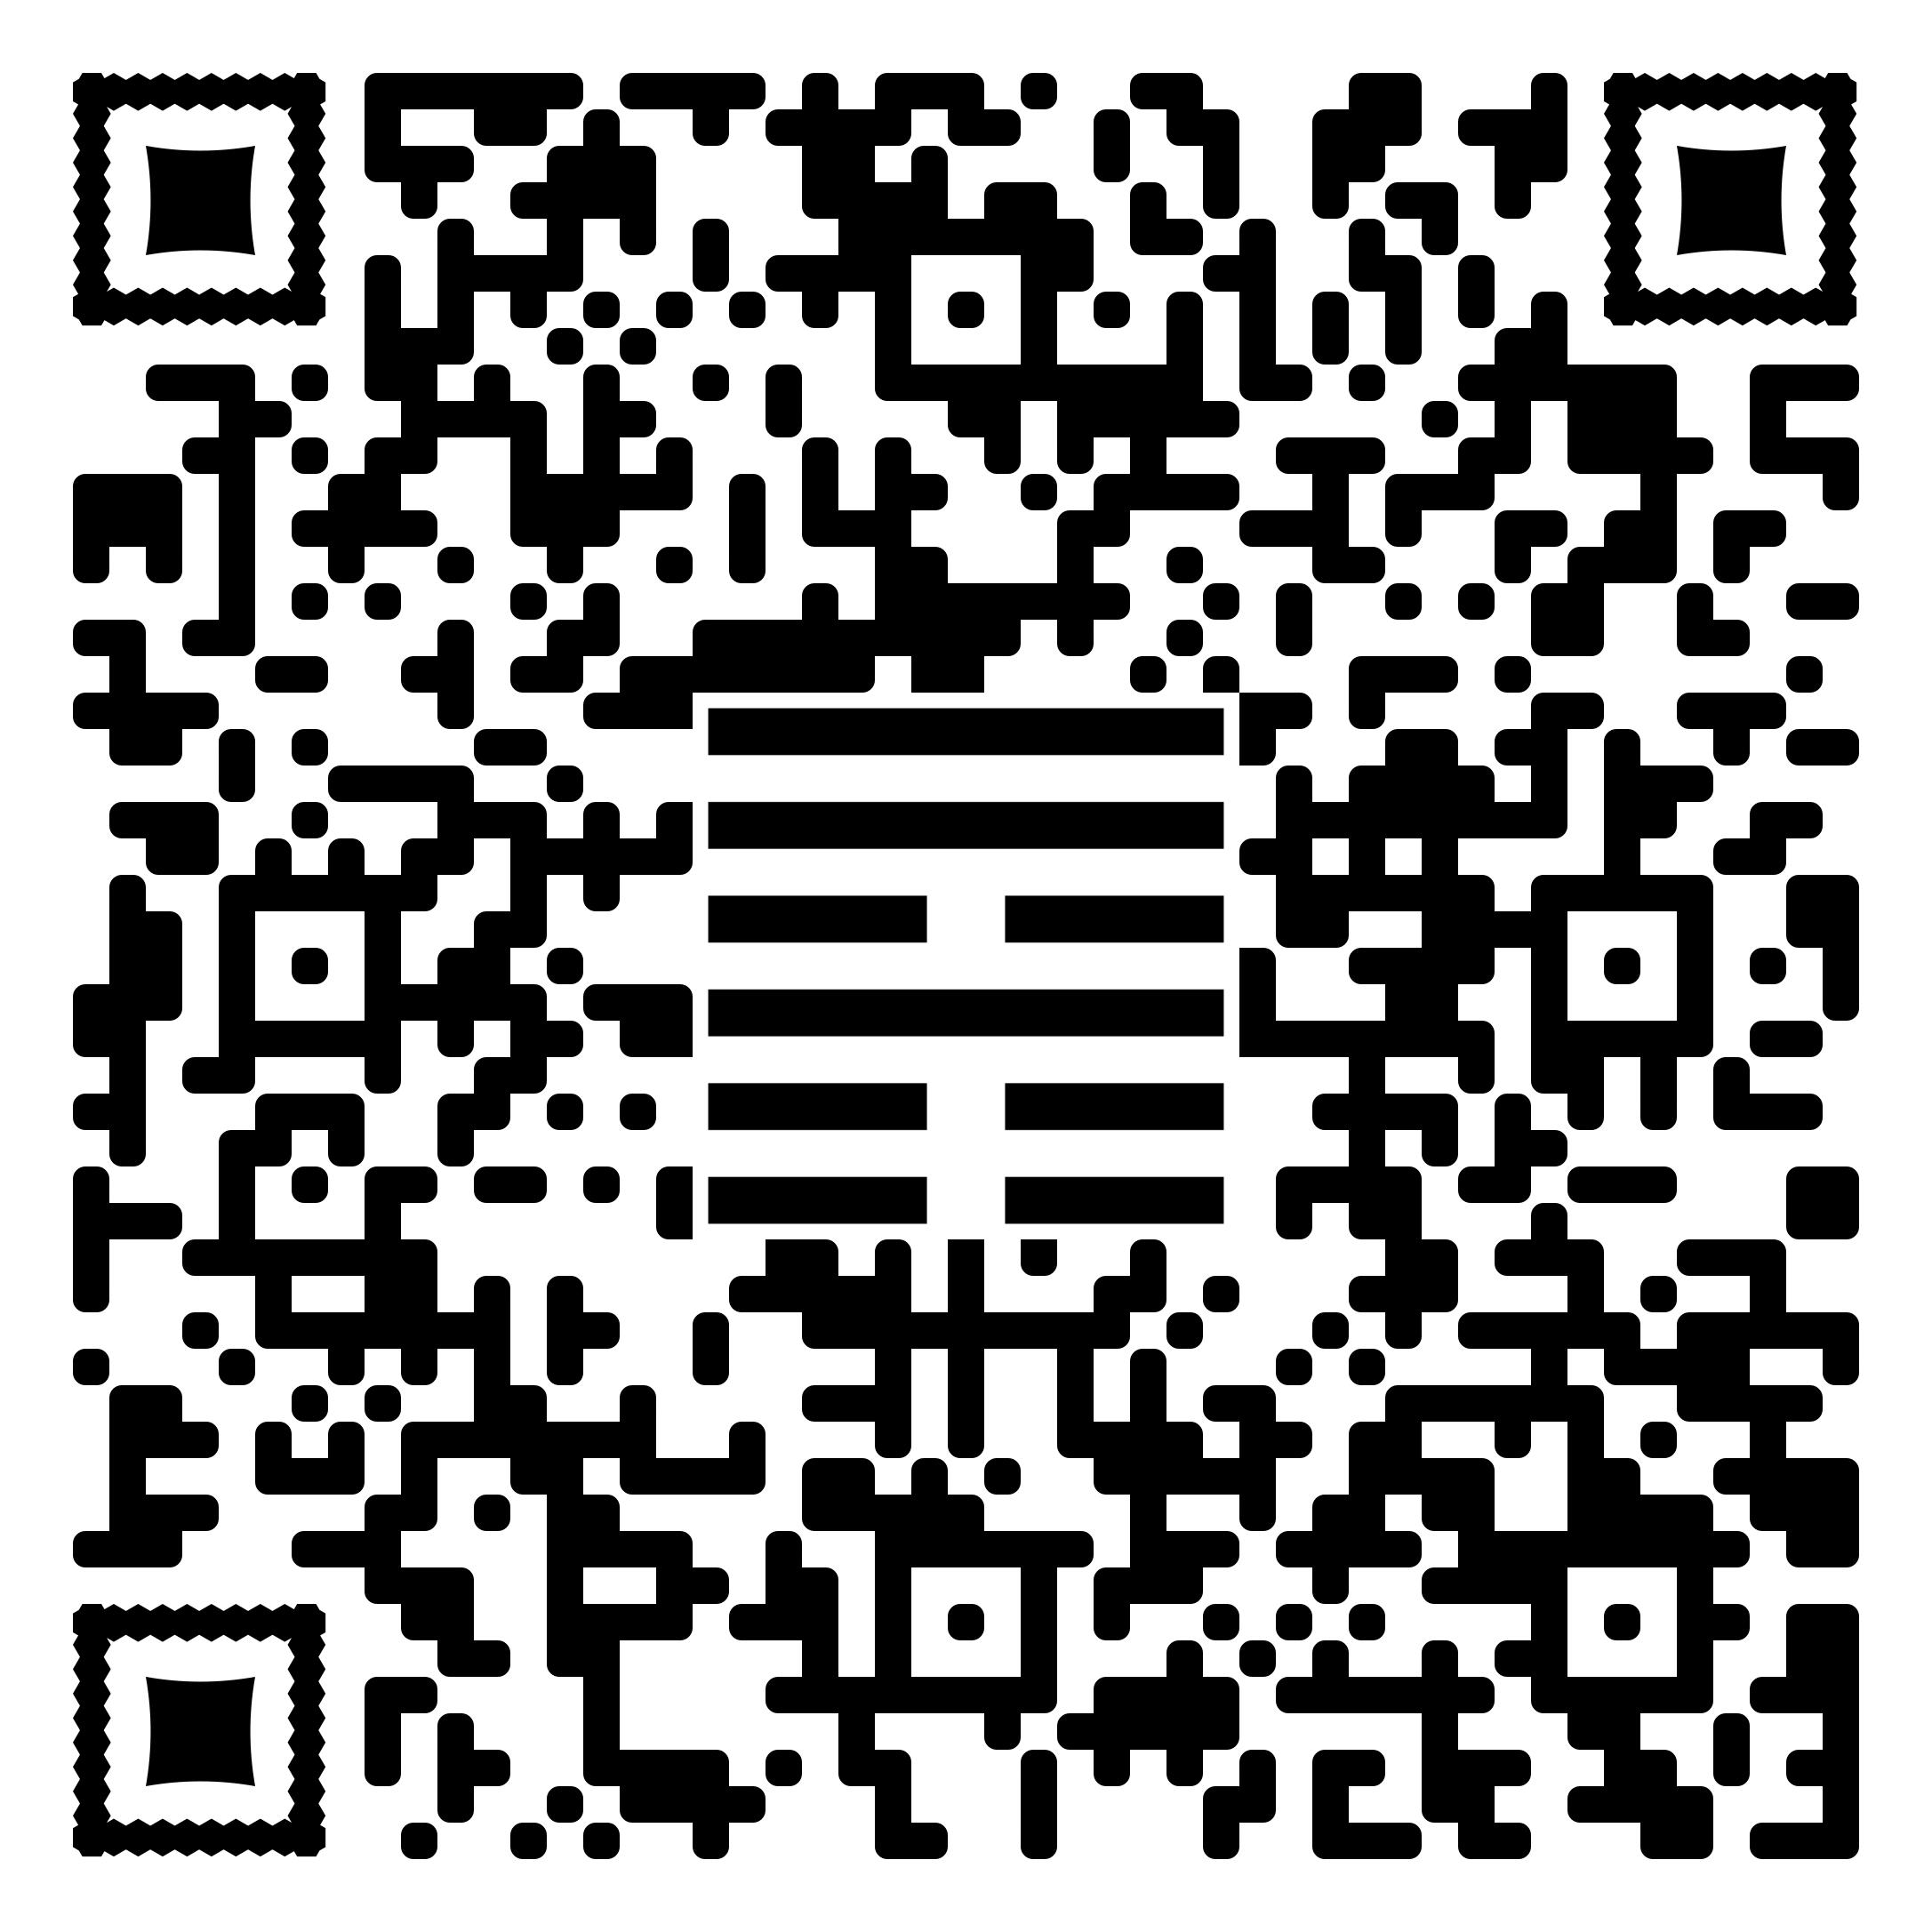 qr-code-53.png